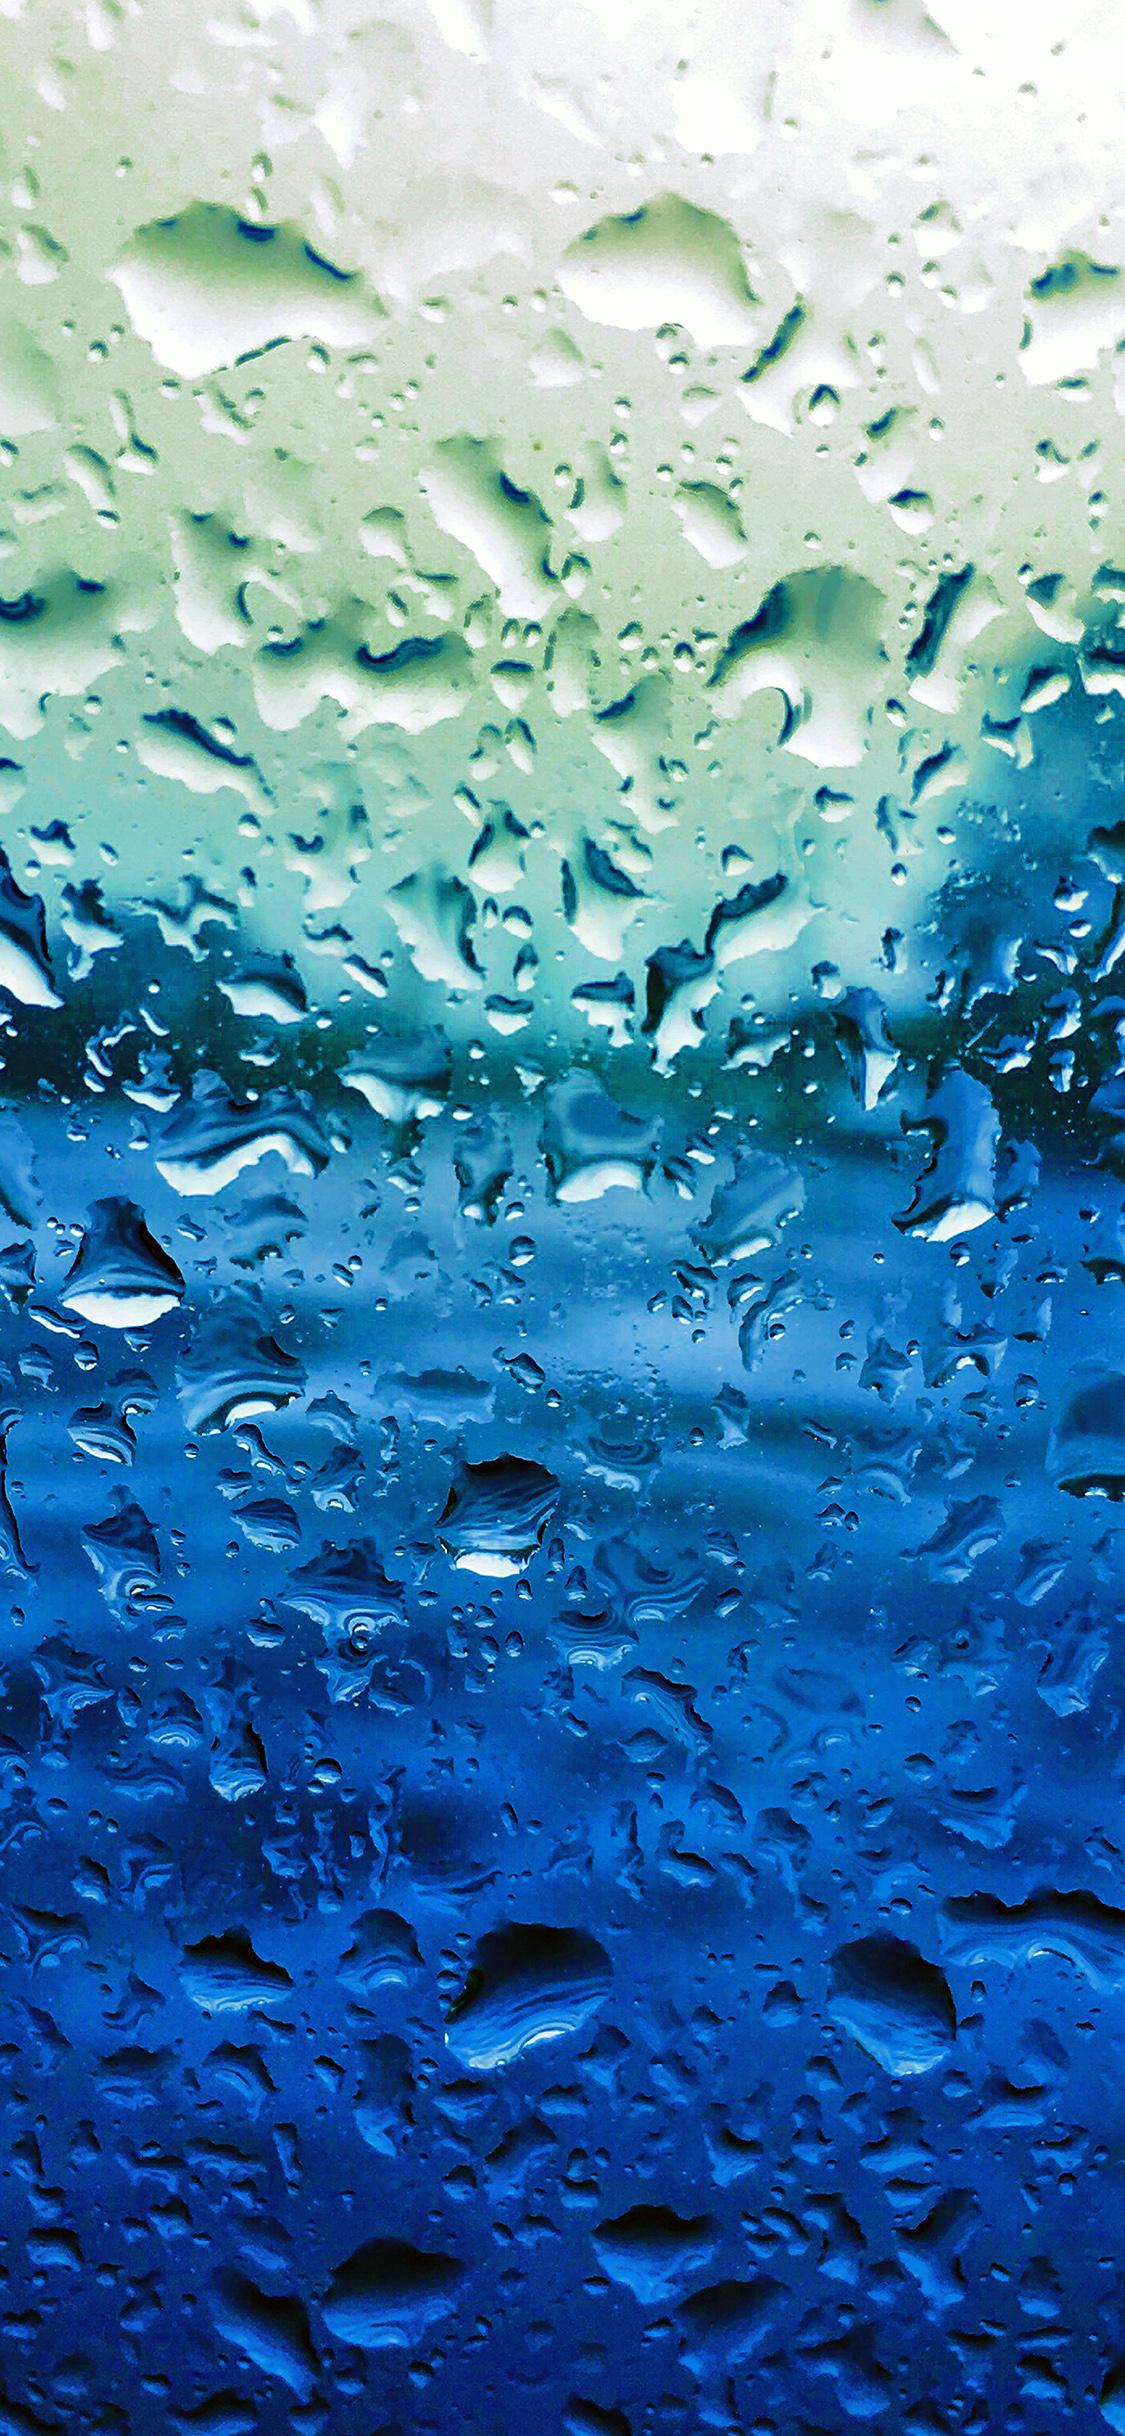 iPhonexpapers.com-Apple-iPhone-wallpaper-vr69-rain-drop-window-blue-sad-pattern